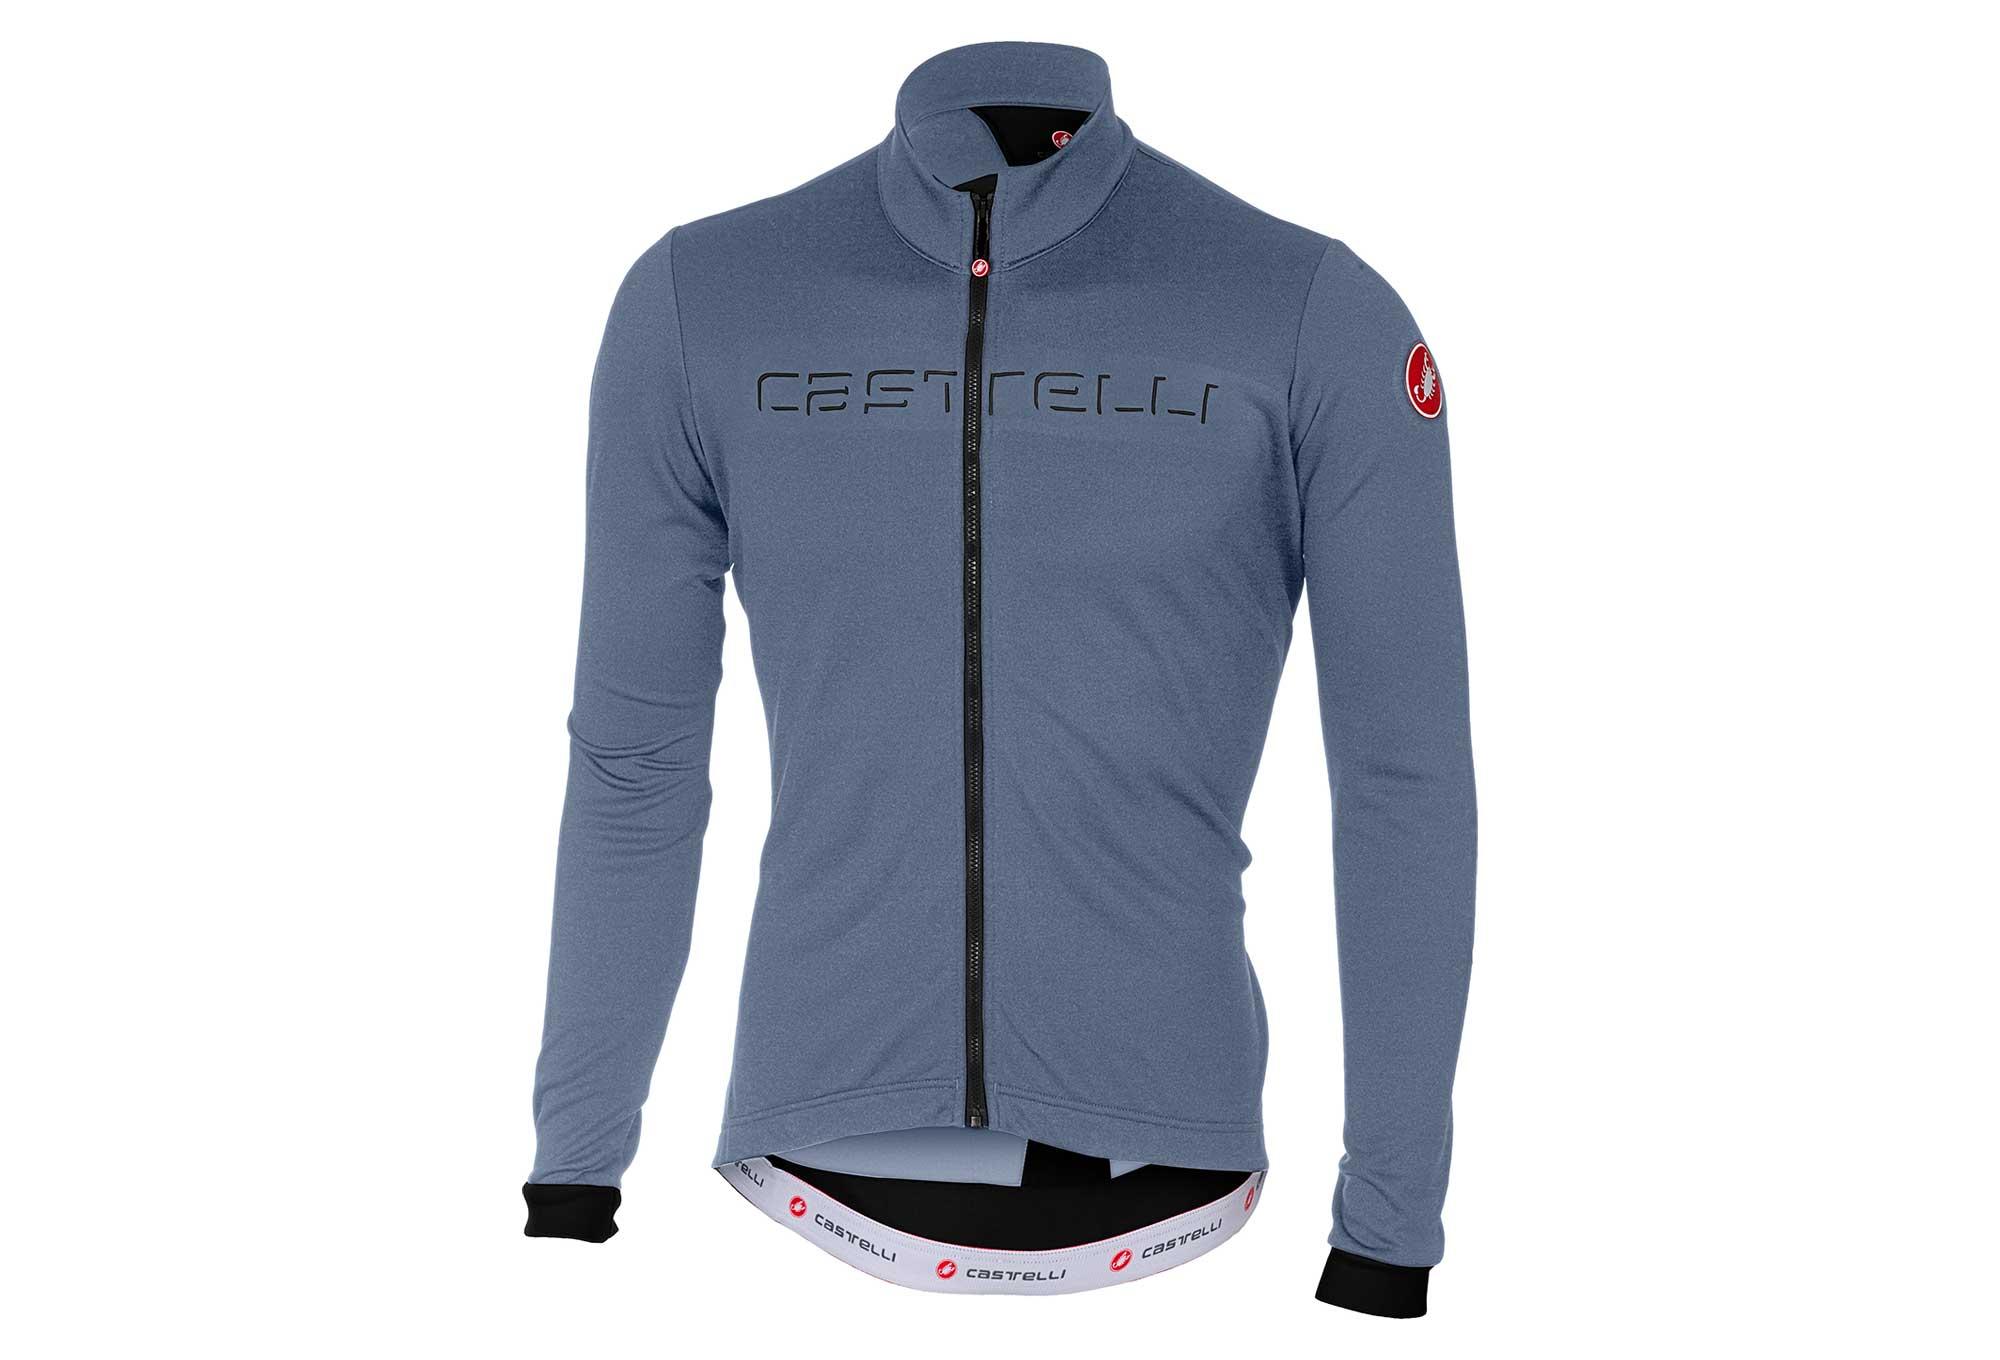 Castelli Fondo Long Sleeves Jersey Moonlight Blue Black  83c2350c2